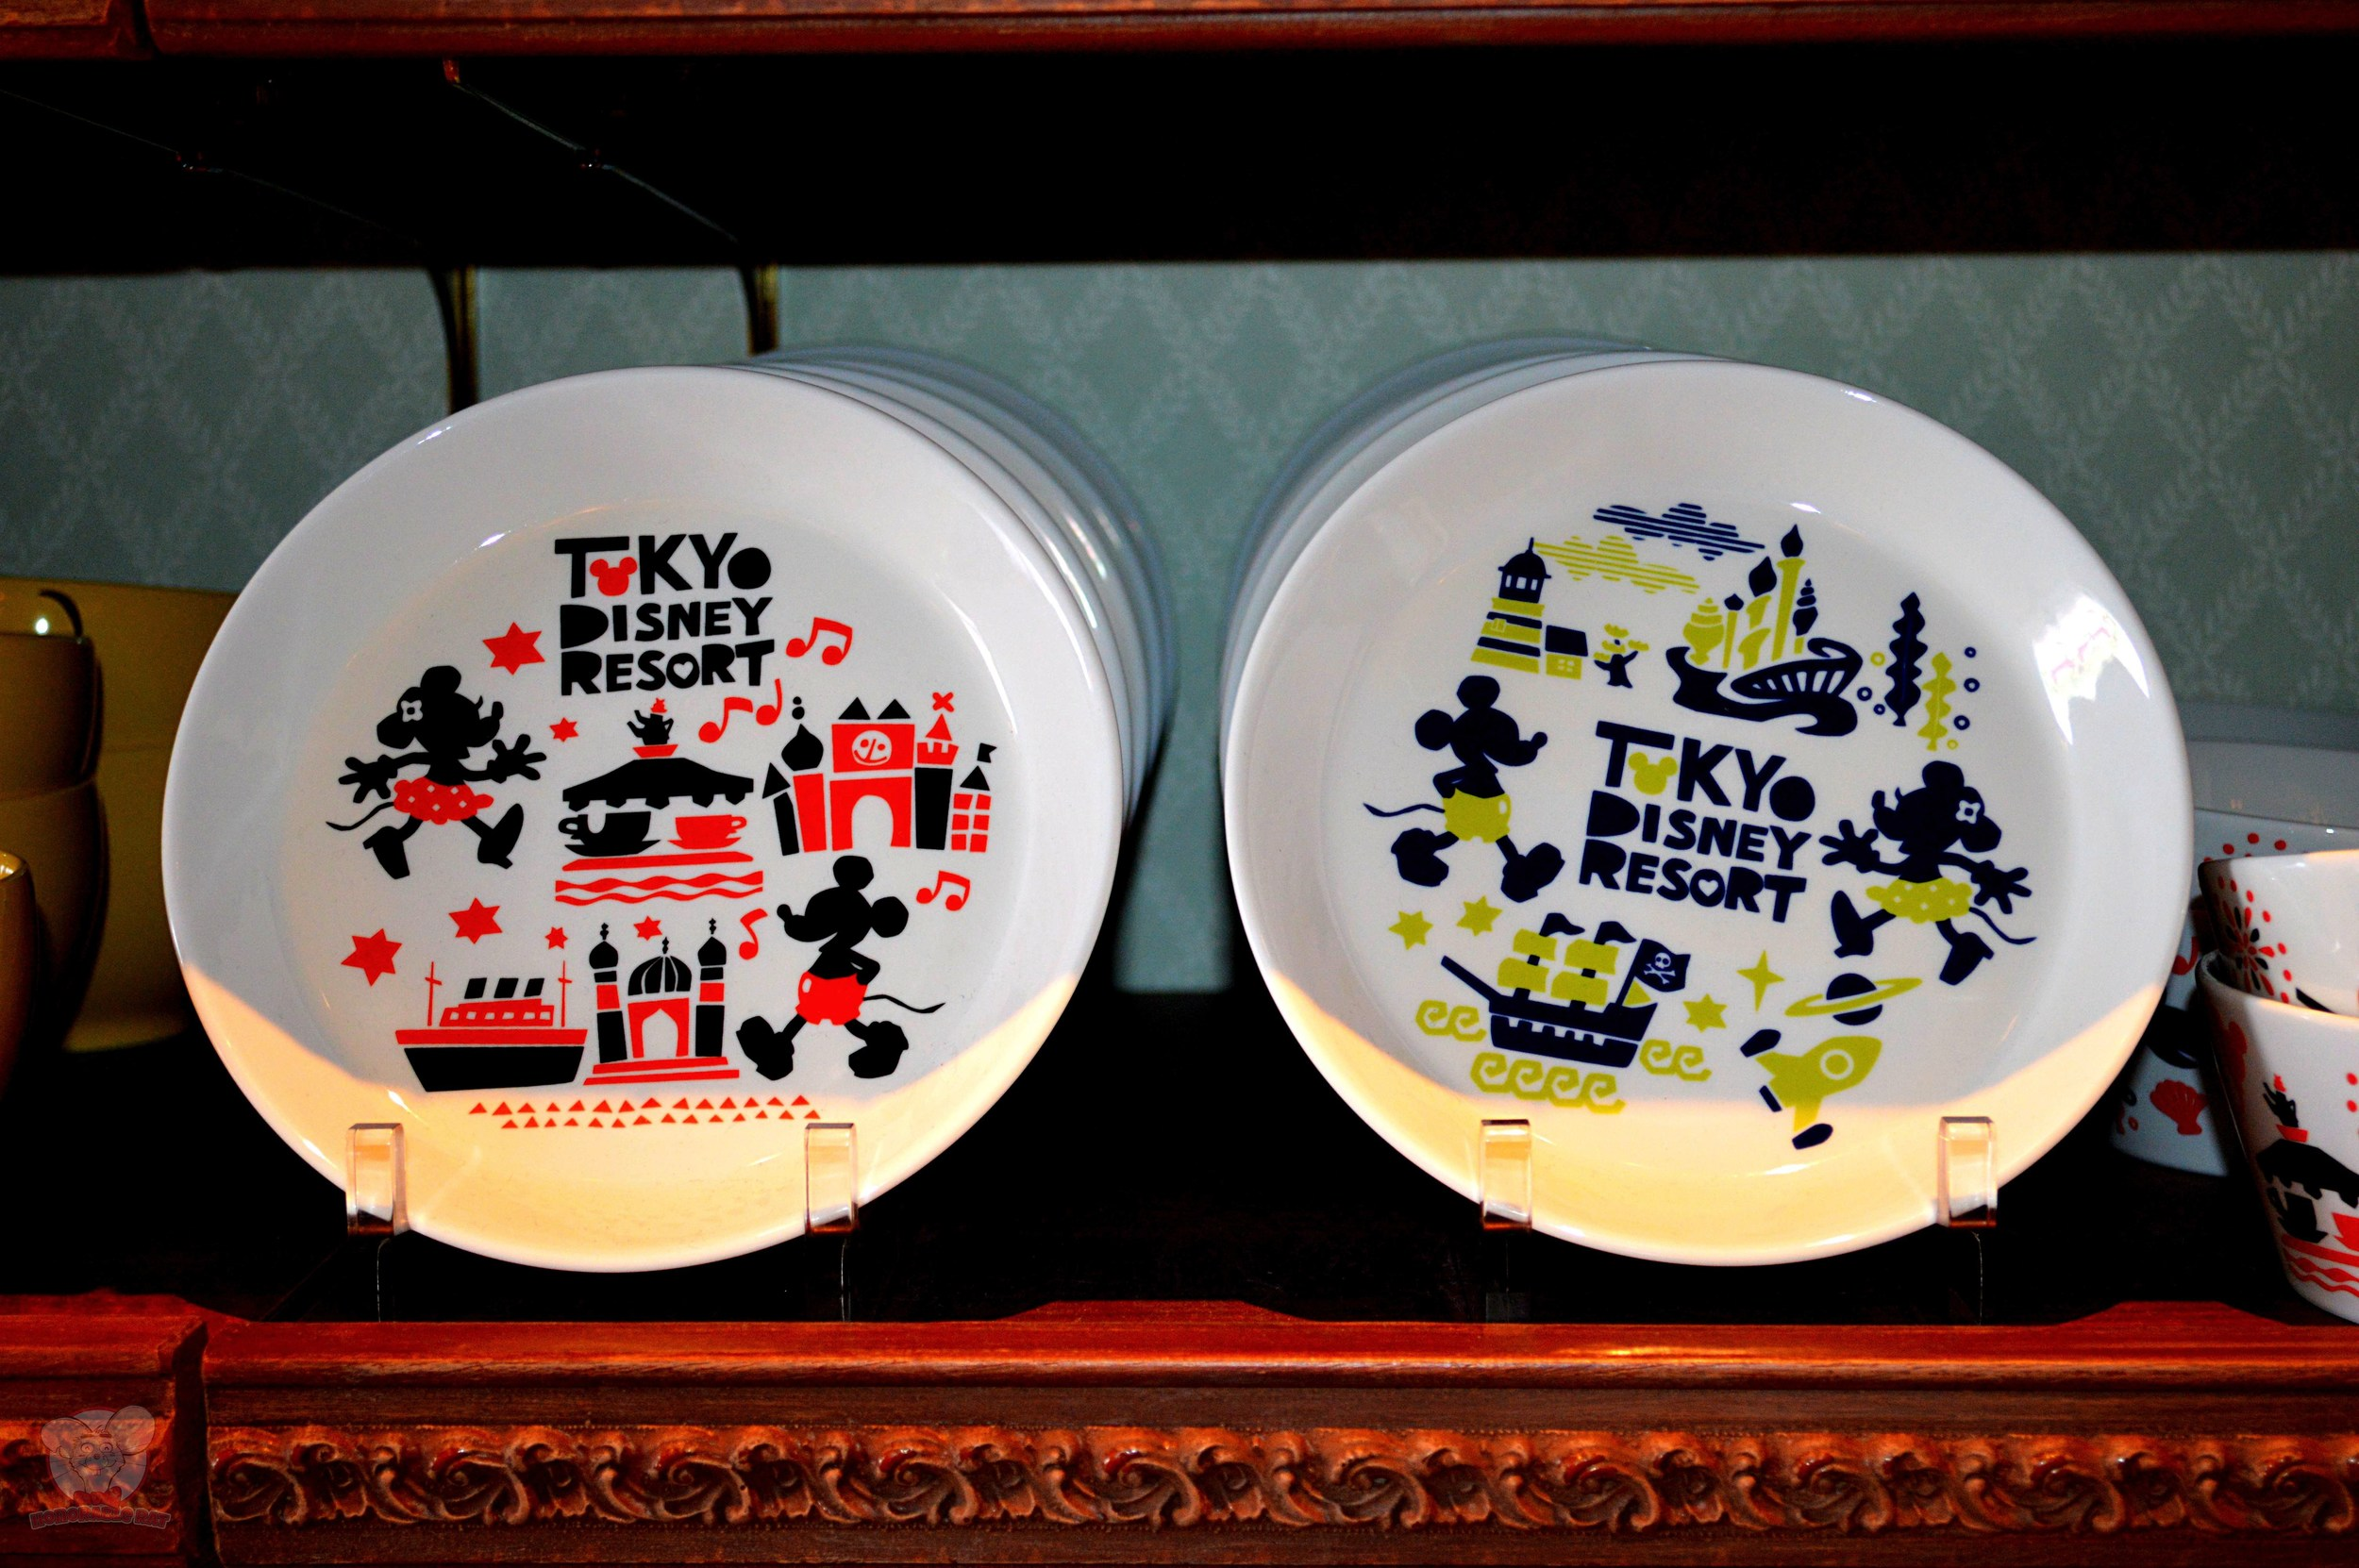 Tokyo Disney Resort plate: 1000yen